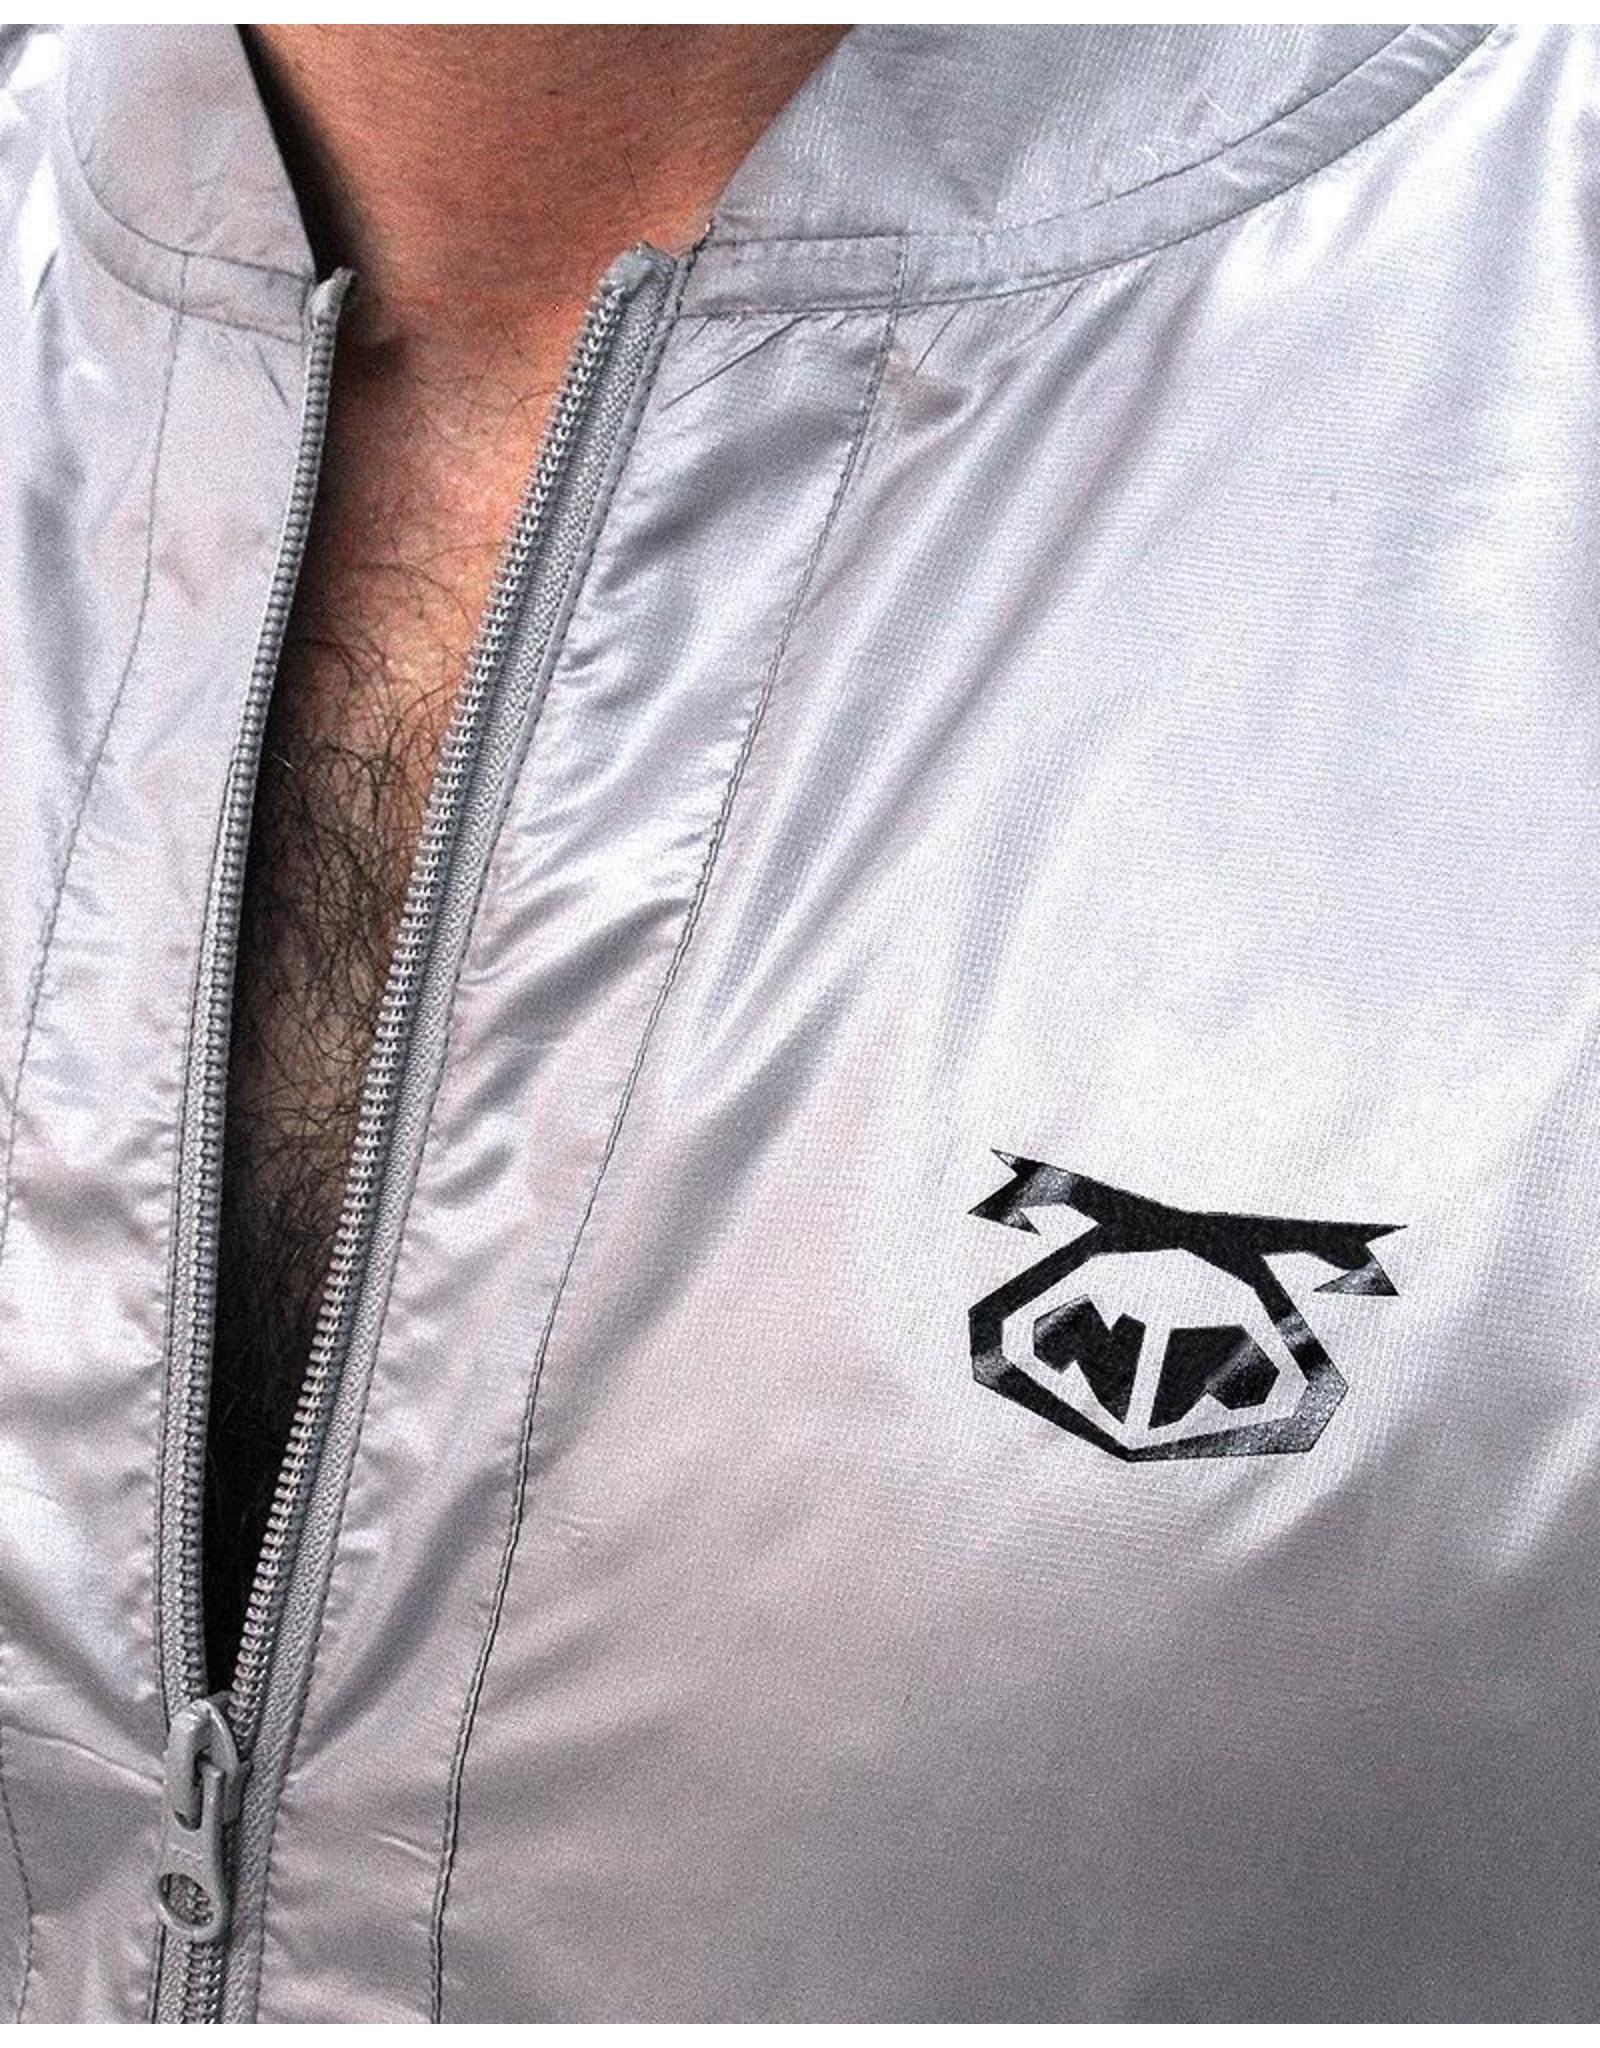 Nasty Pig Nasty Pig Launch Jacket